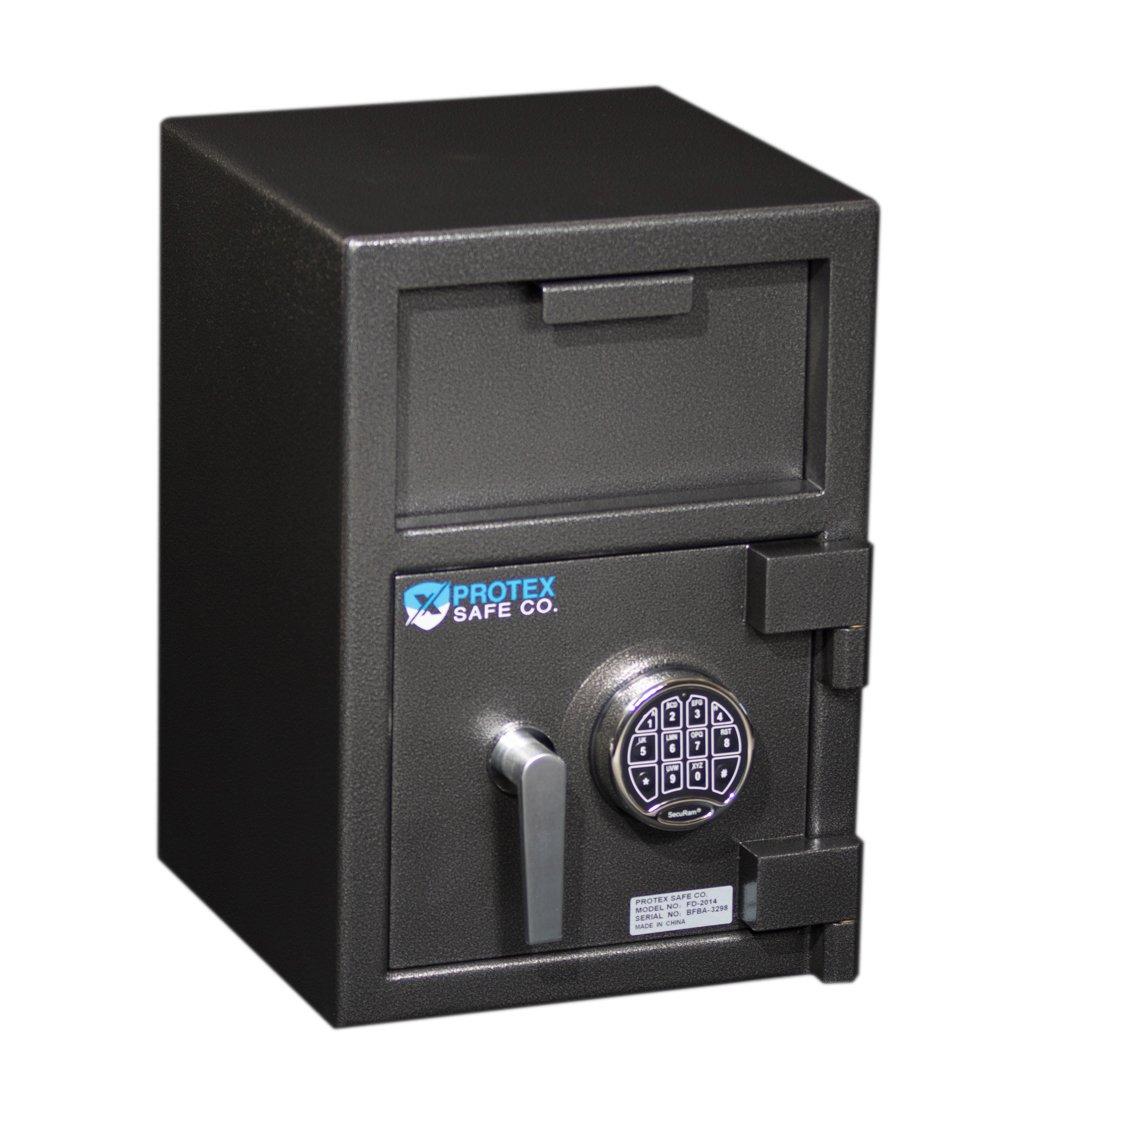 Protex Medium Front Loading Depository Safe (FD-2014)